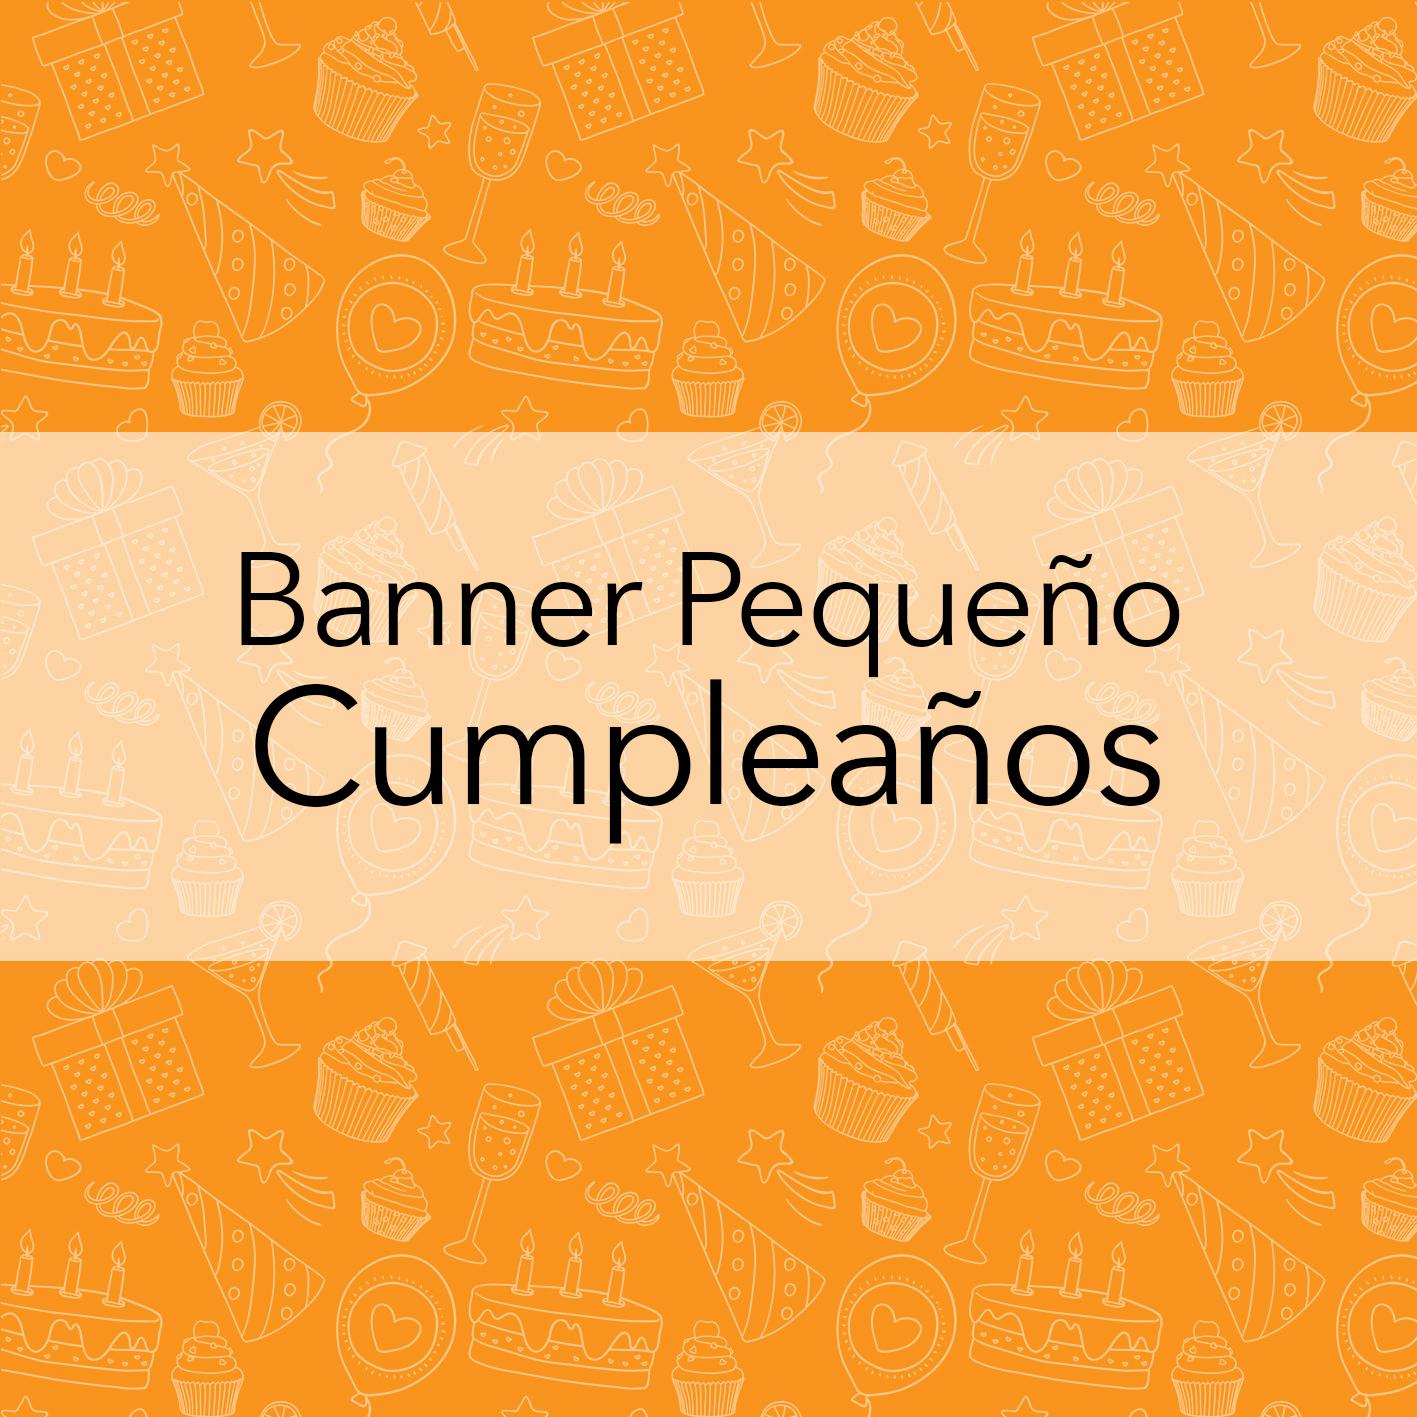 BANNERS PEQUEÑOS - CUMPLEAÑOS